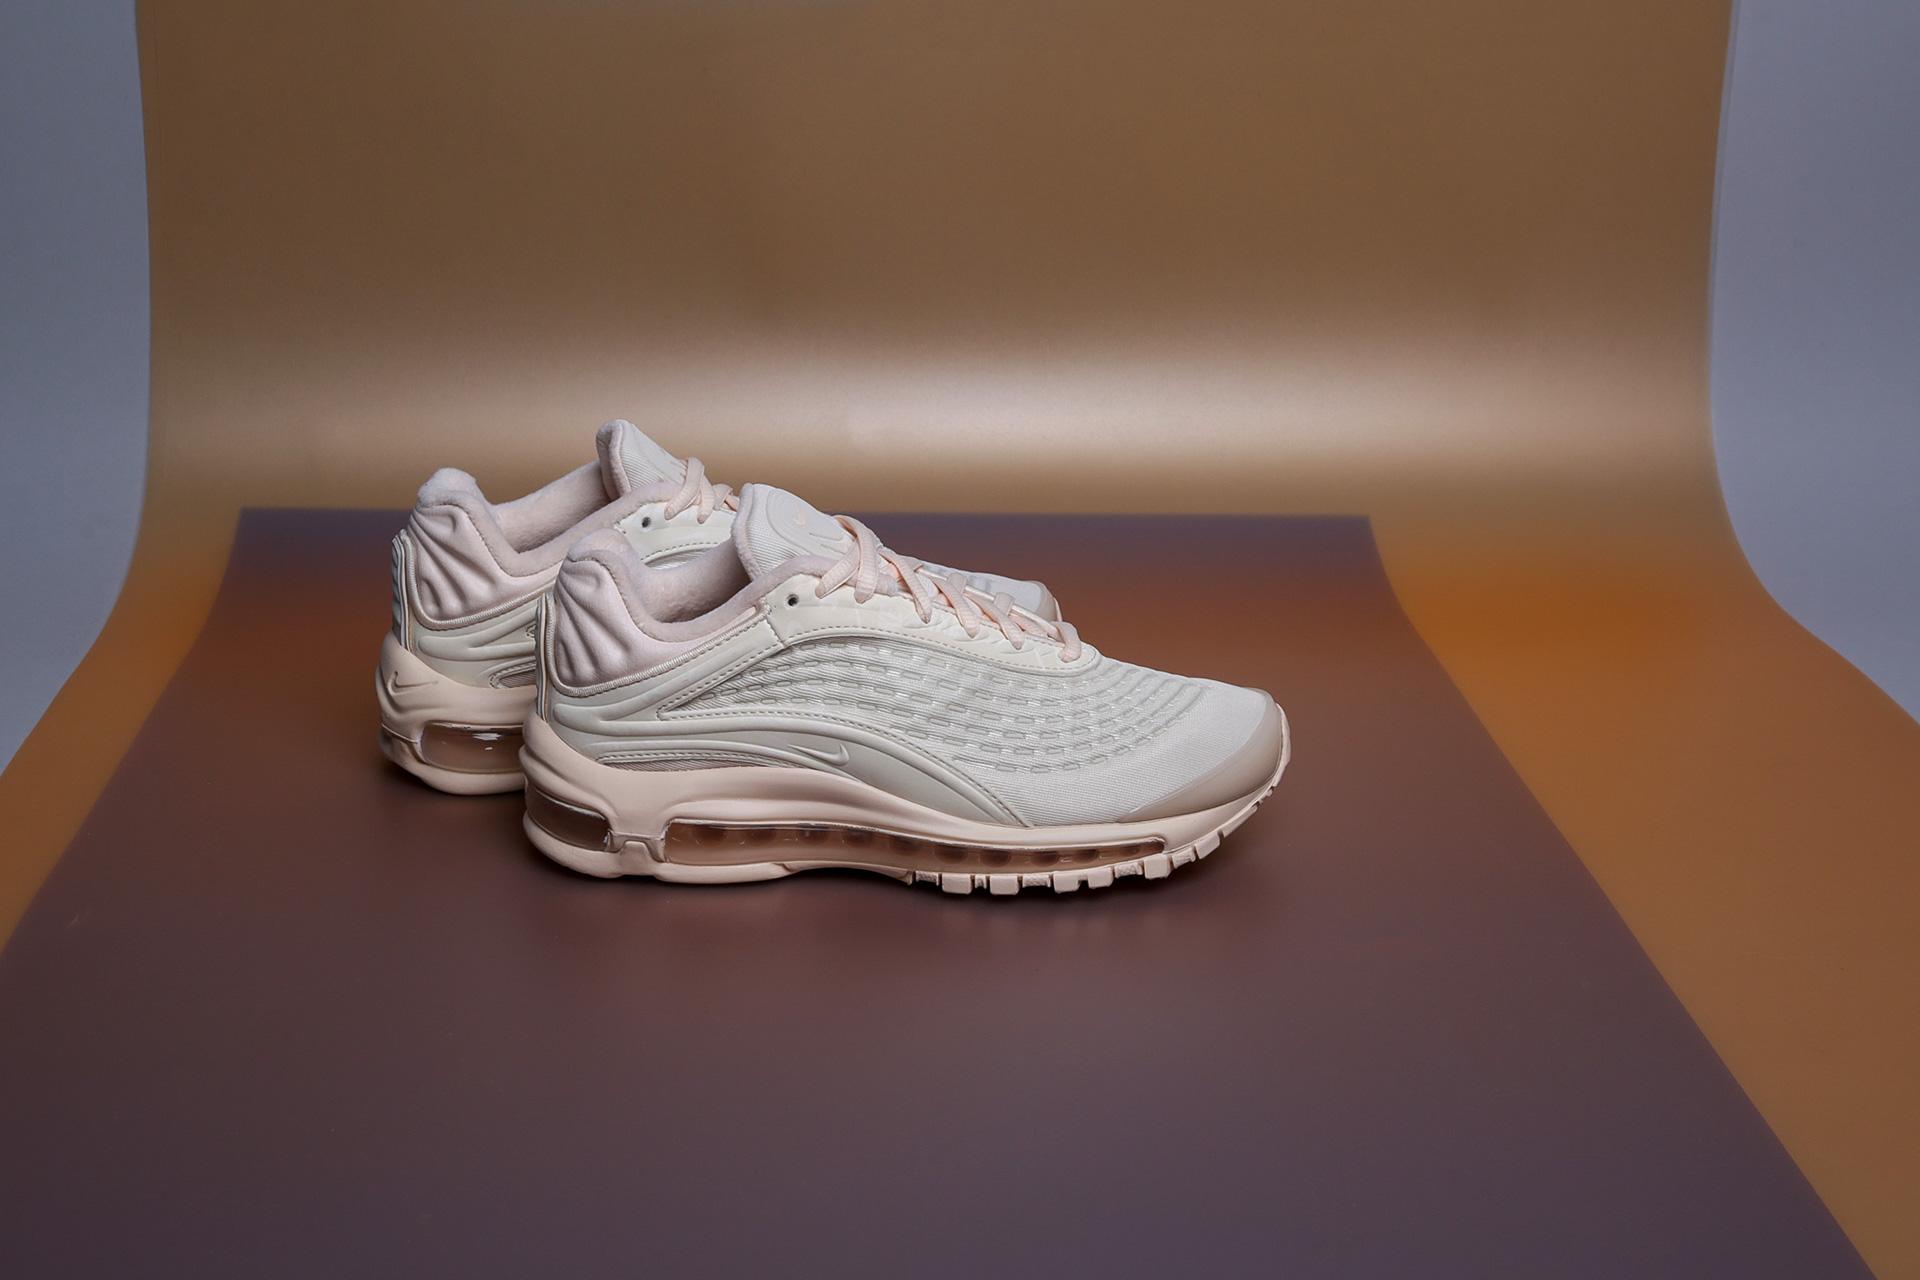 3b2c475f Купить бежевые женские кроссовки Air Max Deluxe SE от Nike (AT8692 ...